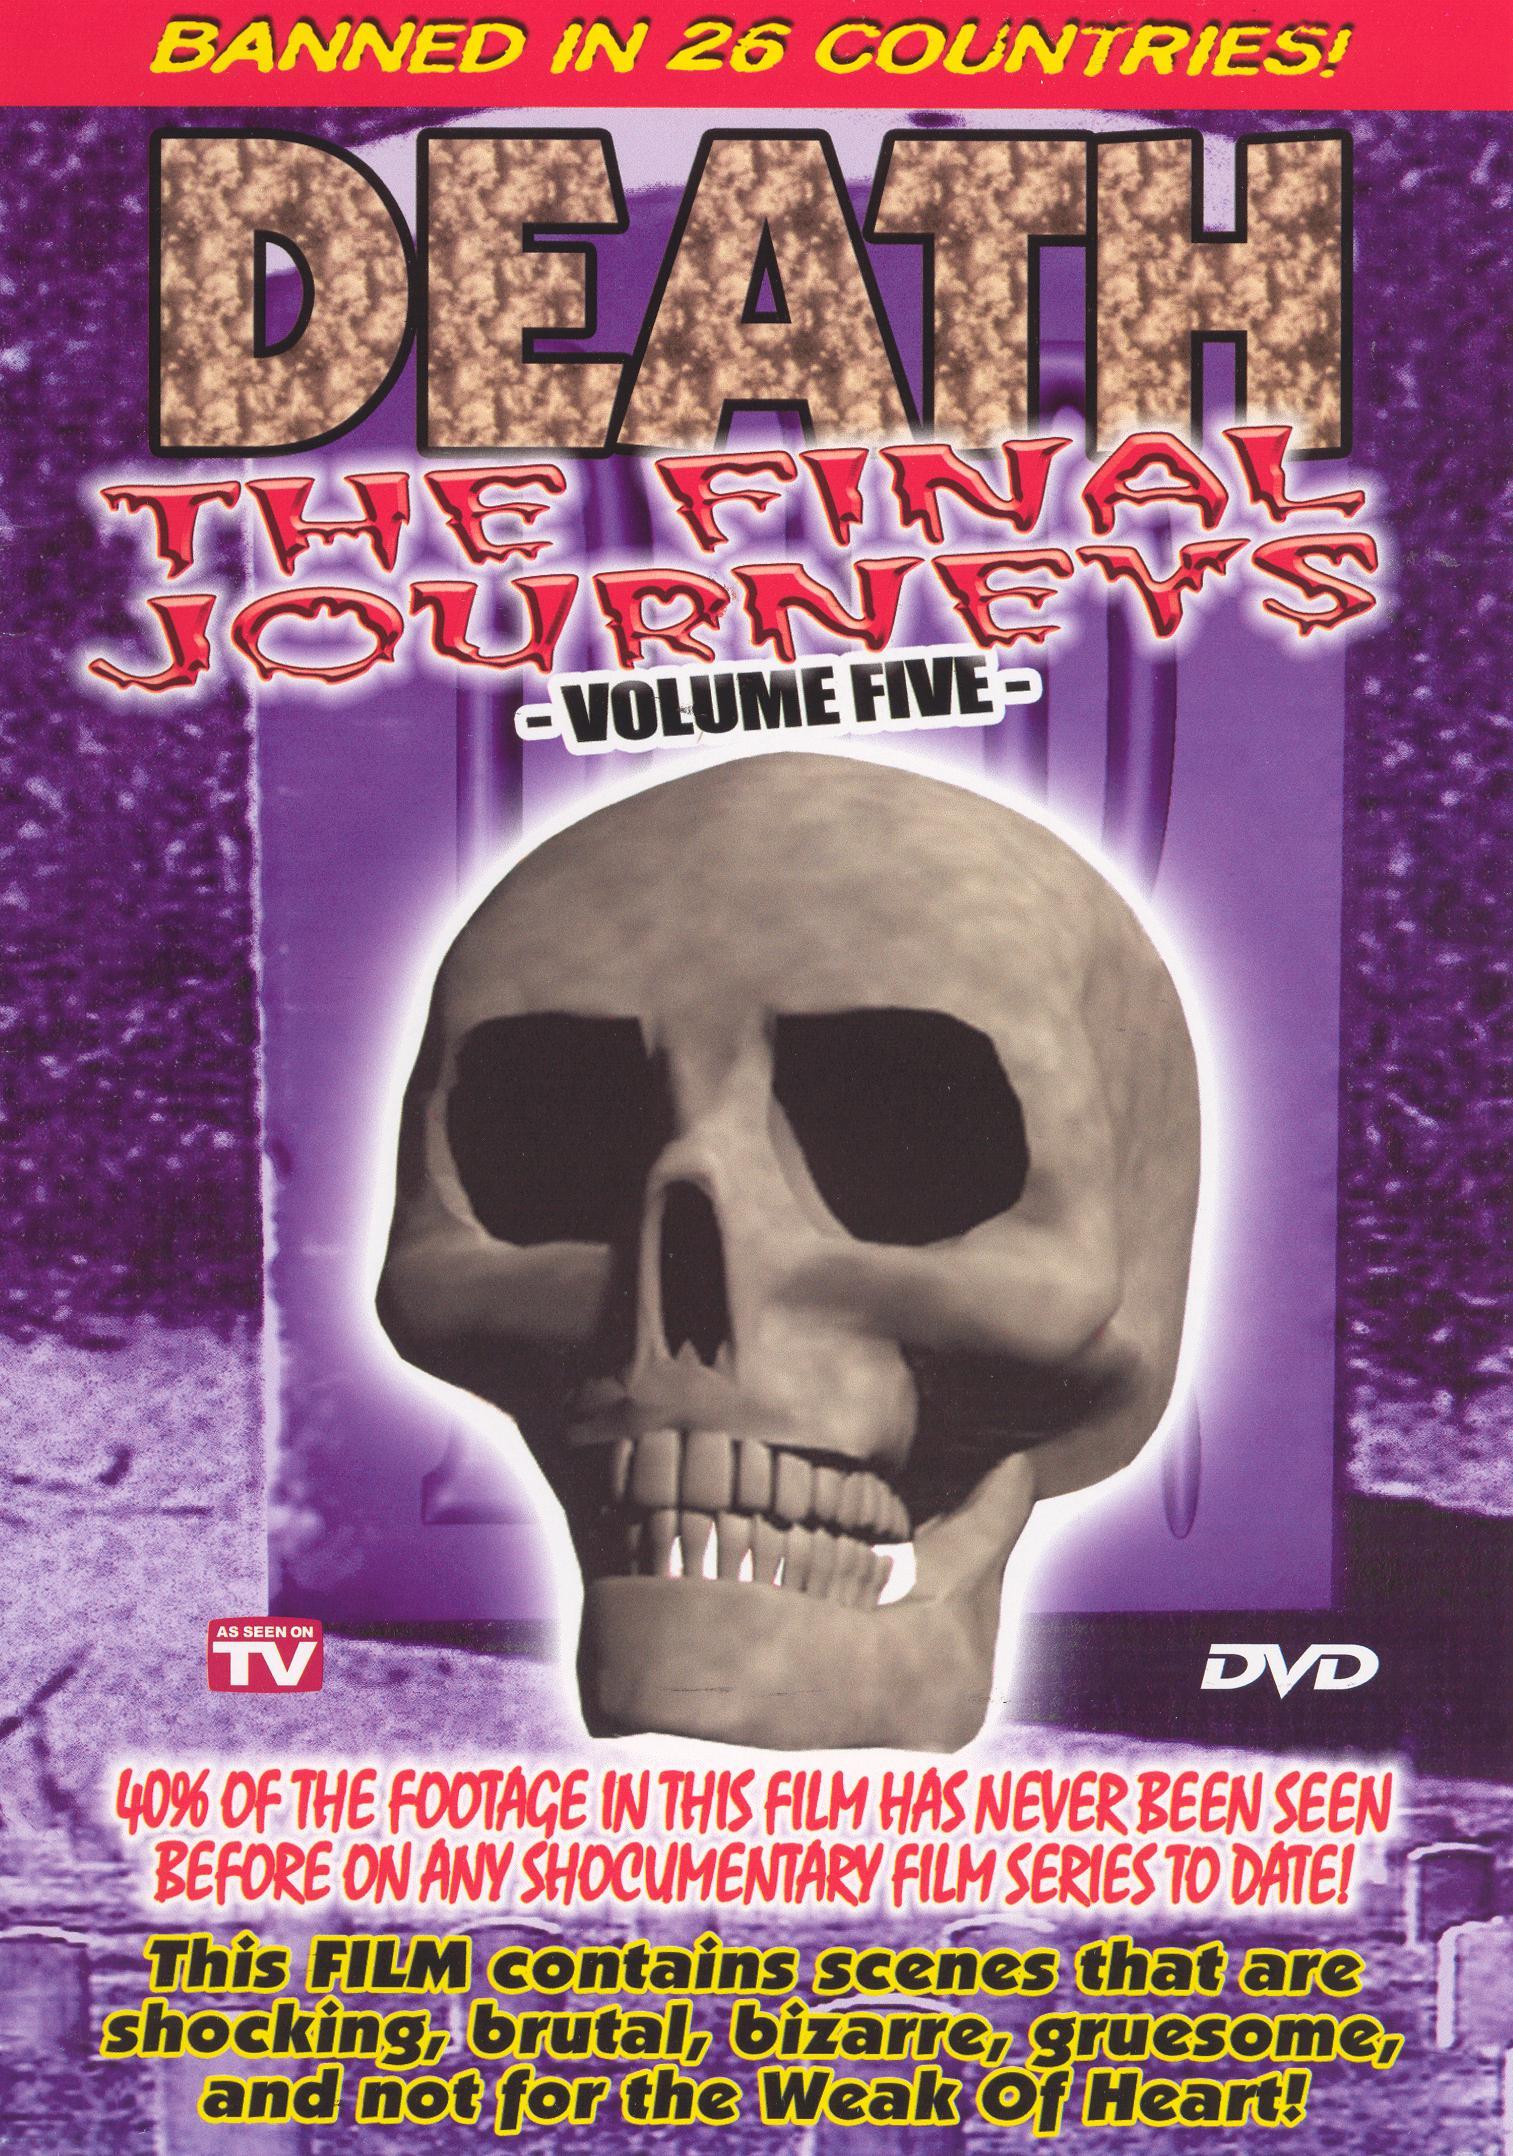 Death: The Final Journey, Vol. 5